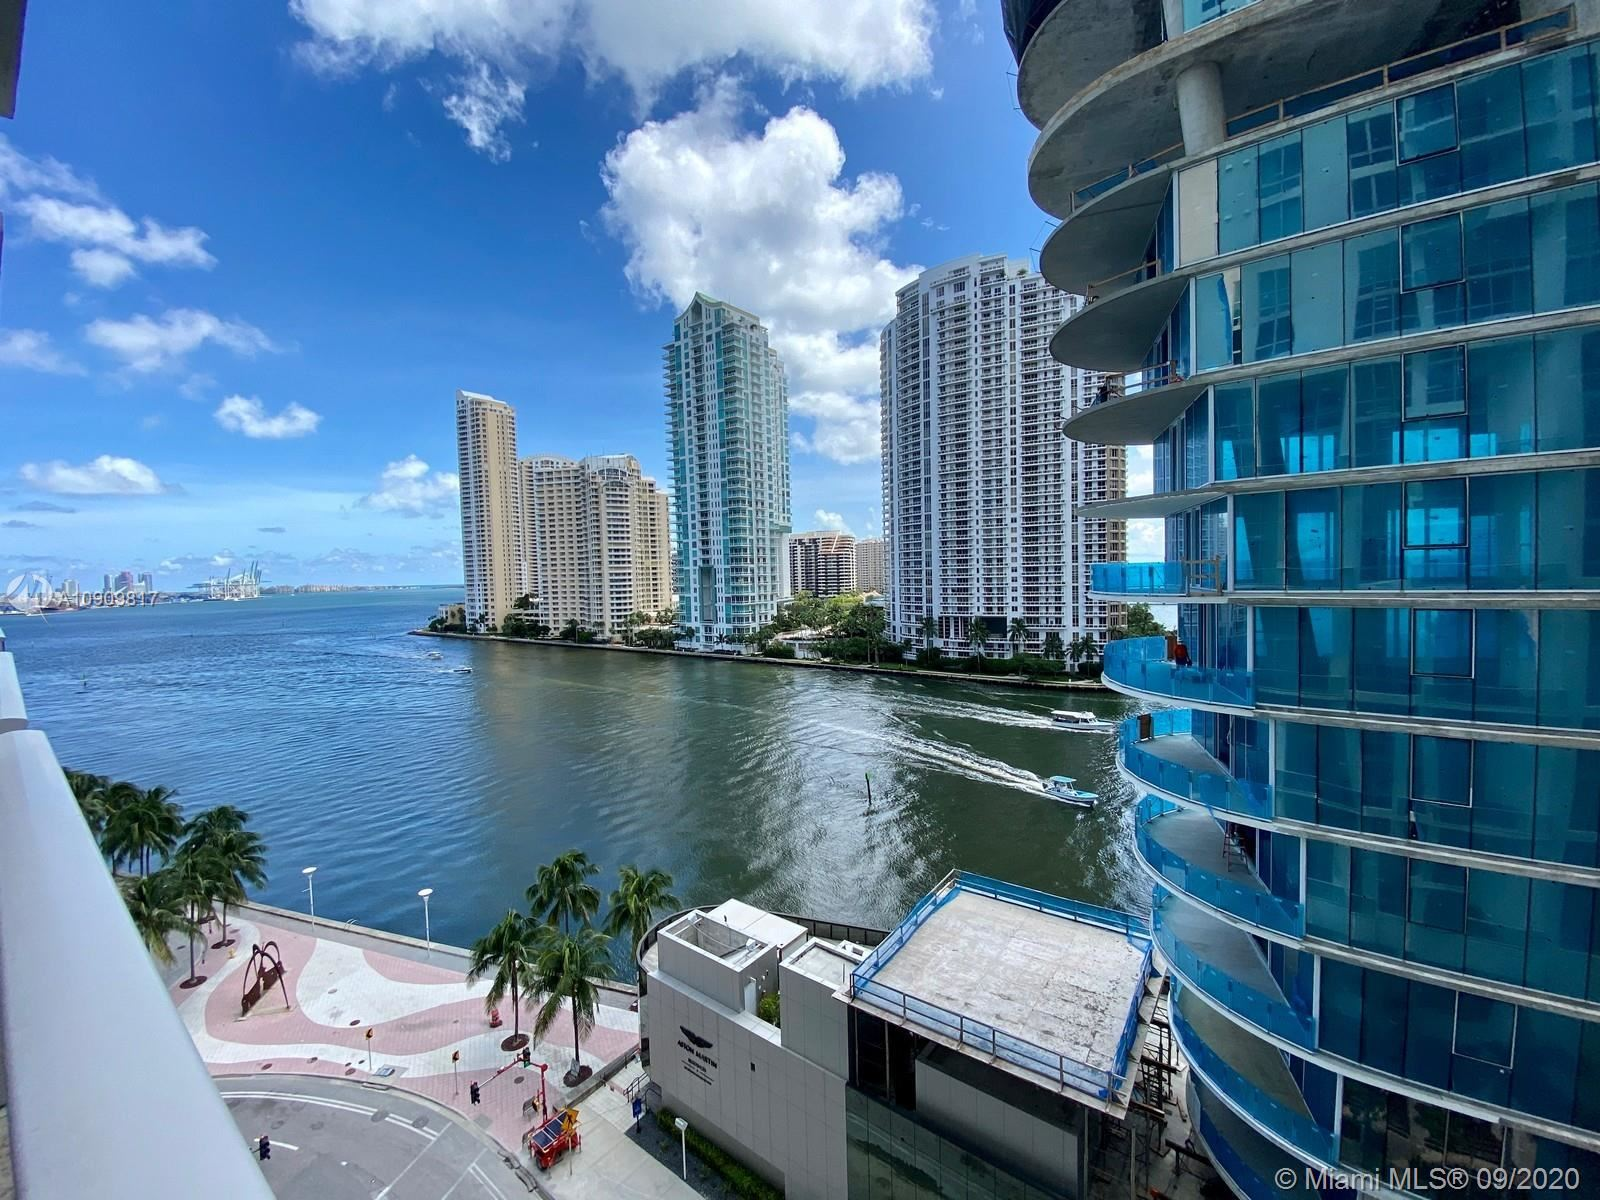 300 S Biscayne Blvd #L-1008, Miami, FL 33131 - #: A10909817